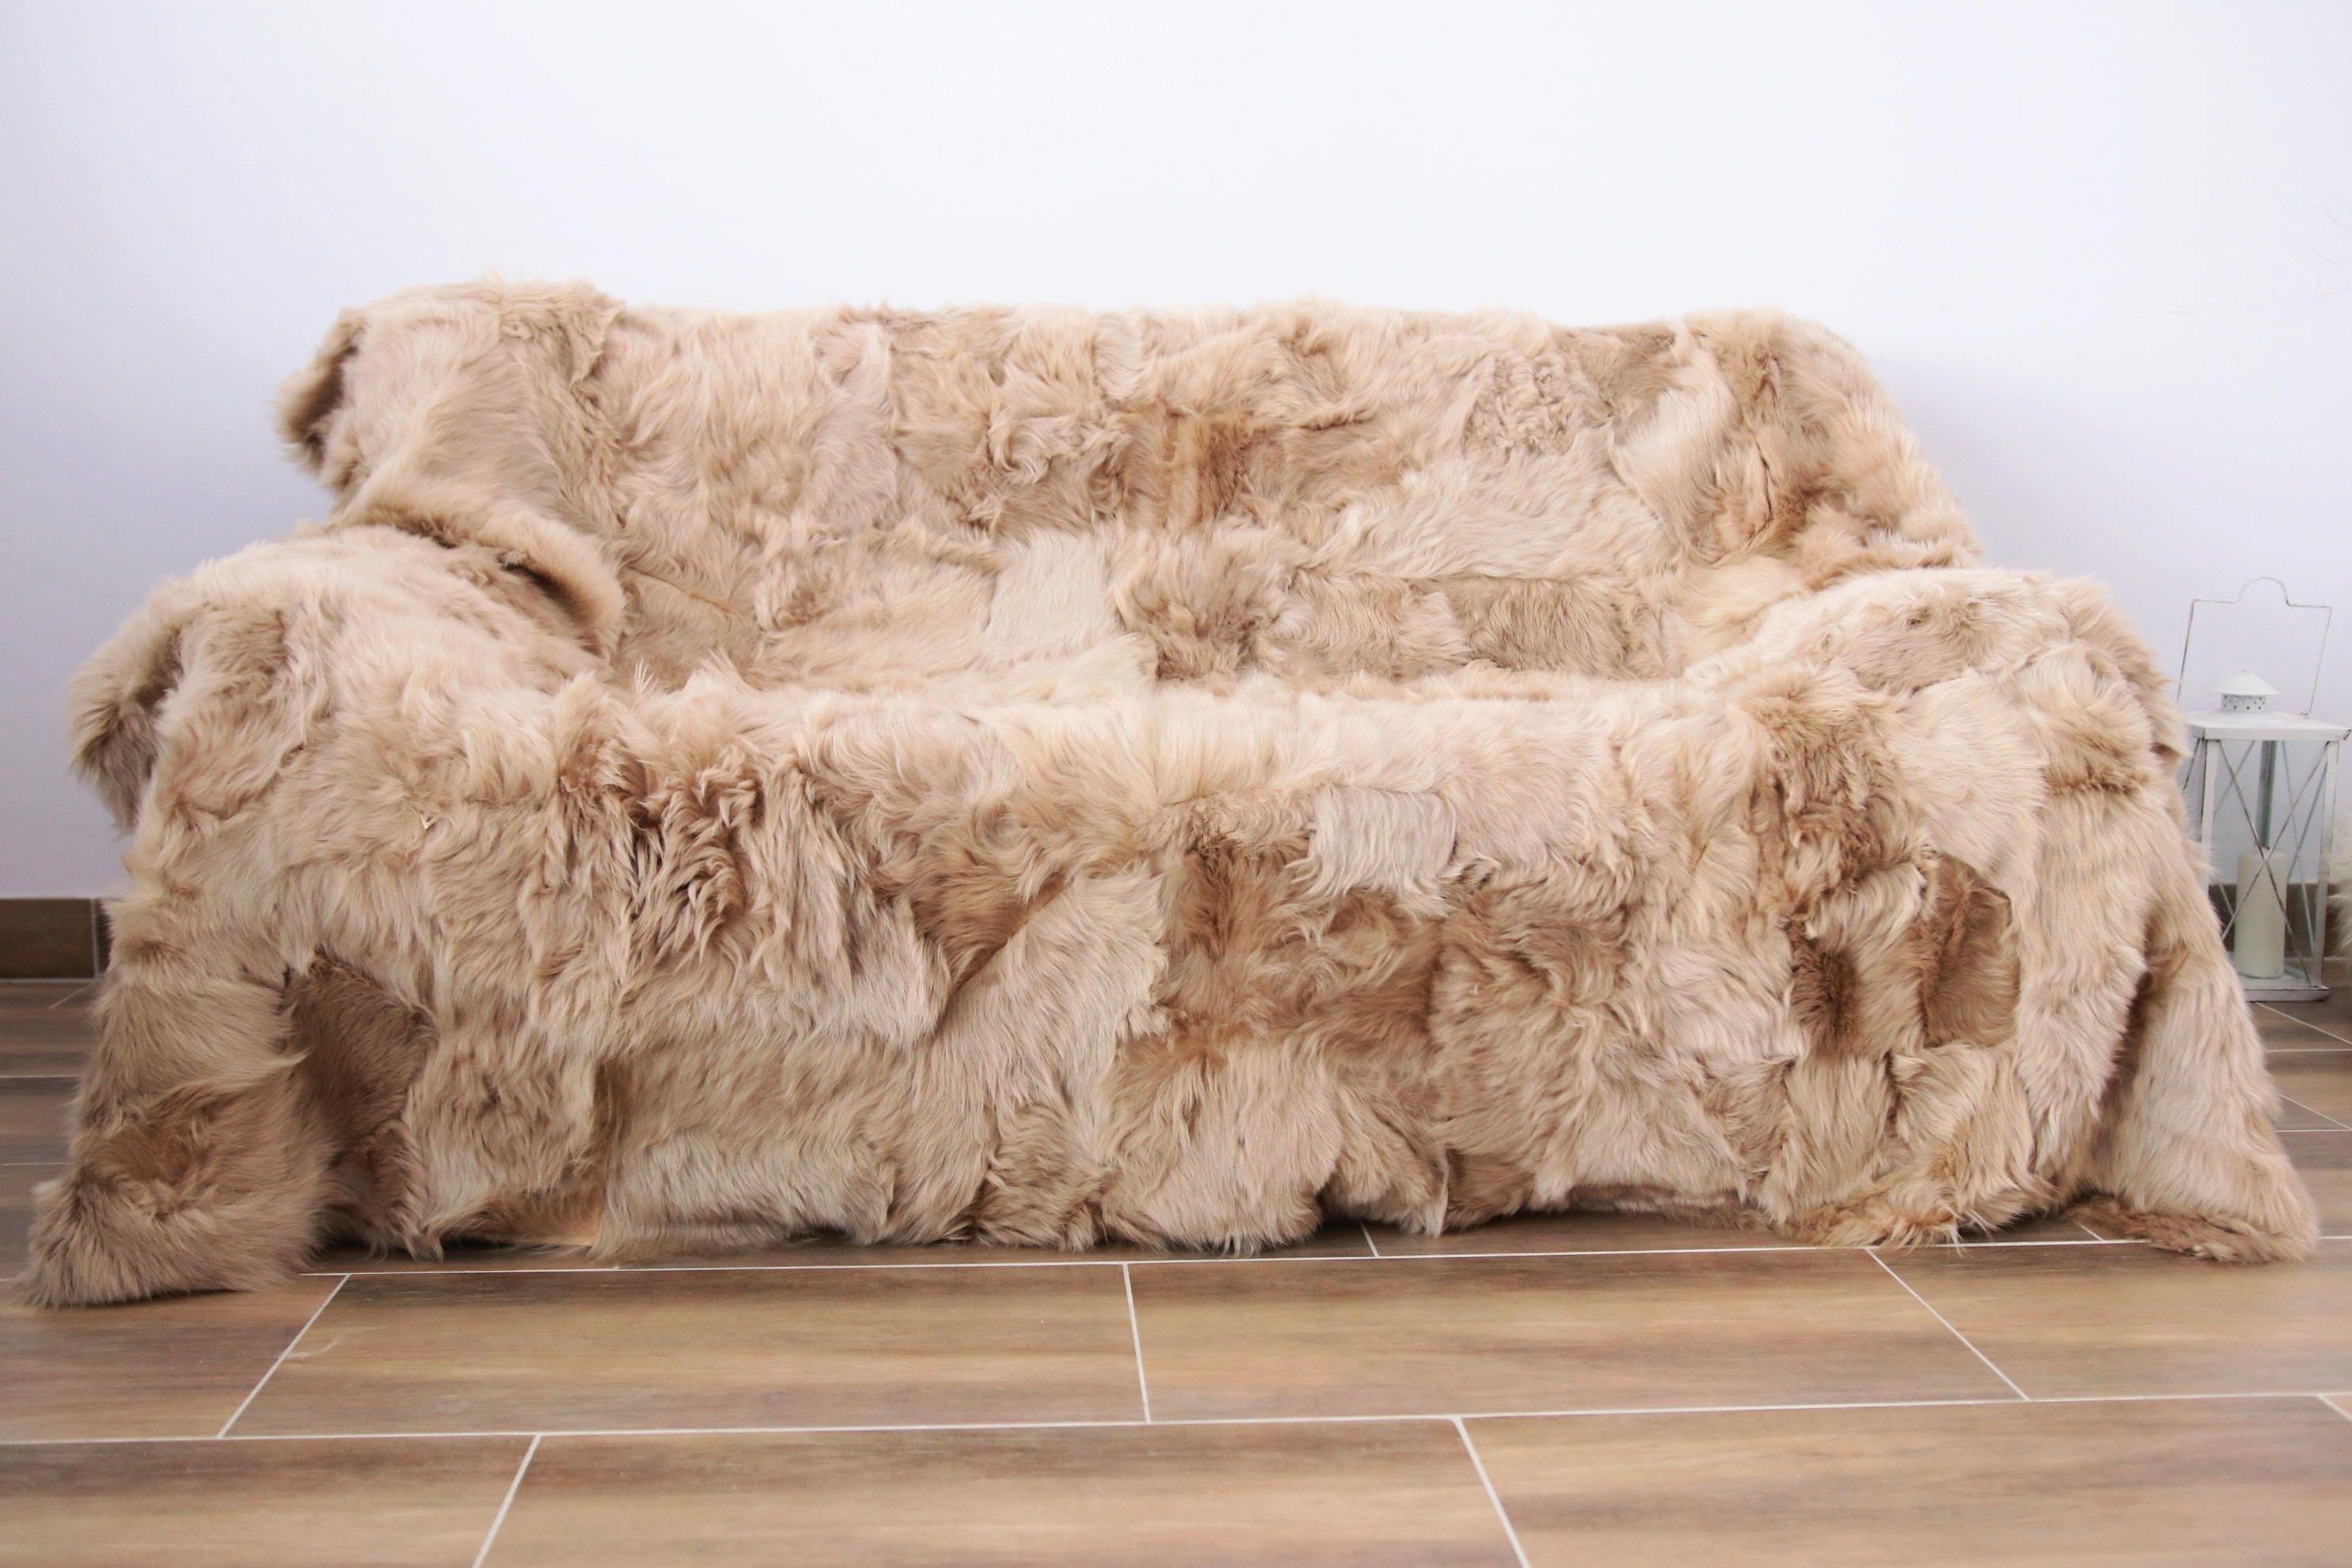 Real Sheepskin Toscana Blanket Throw Champagne Fur Sofa Throw Scandinavian Decoration Throws For Sofa Sofa Throws Throw Blanket Blanket Scandinavian Decor